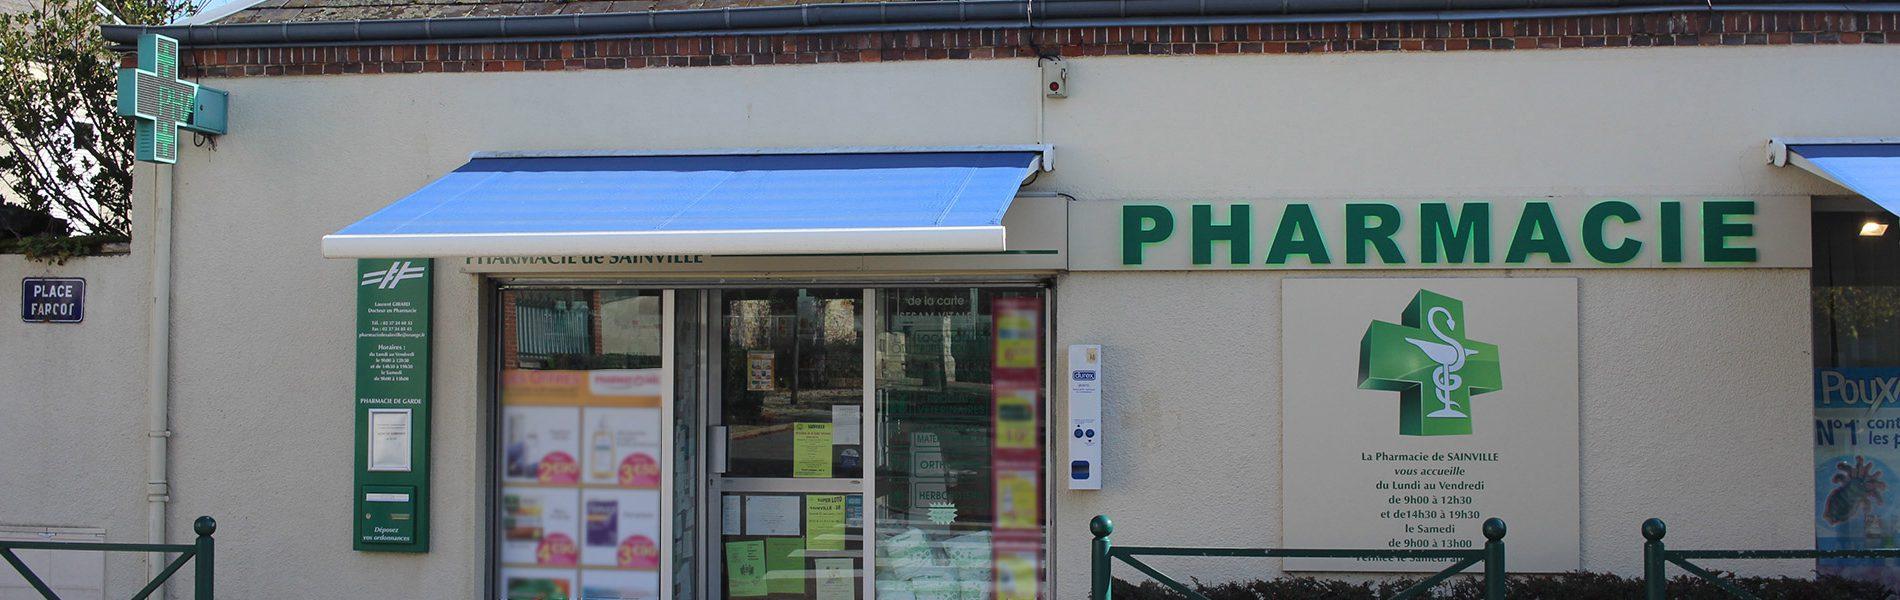 Pharmacie DE SAINVILLE - Image Homepage 1